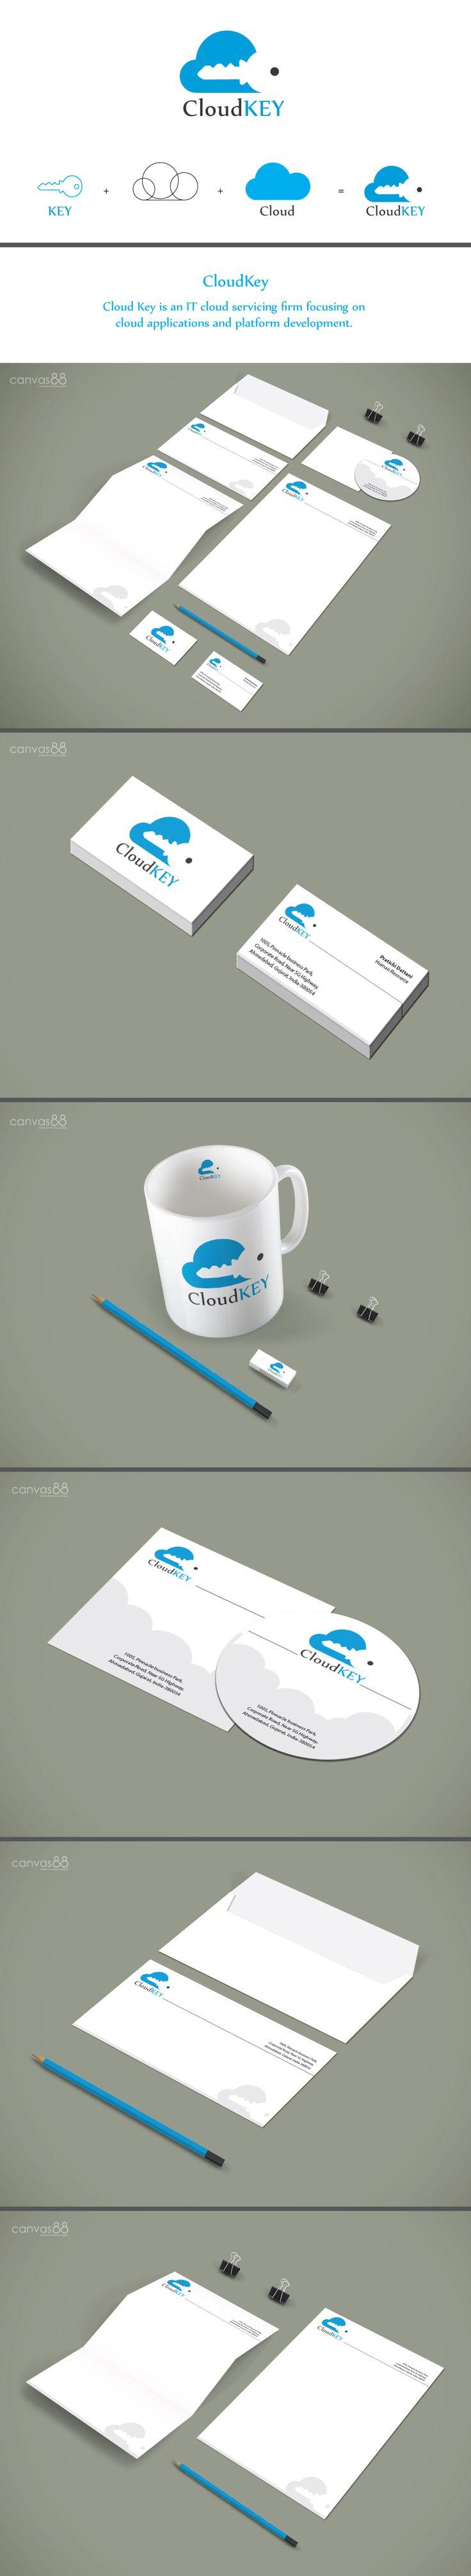 Cloud Key is an IT cloud servicing firm focusing on cloud applications and platform development.